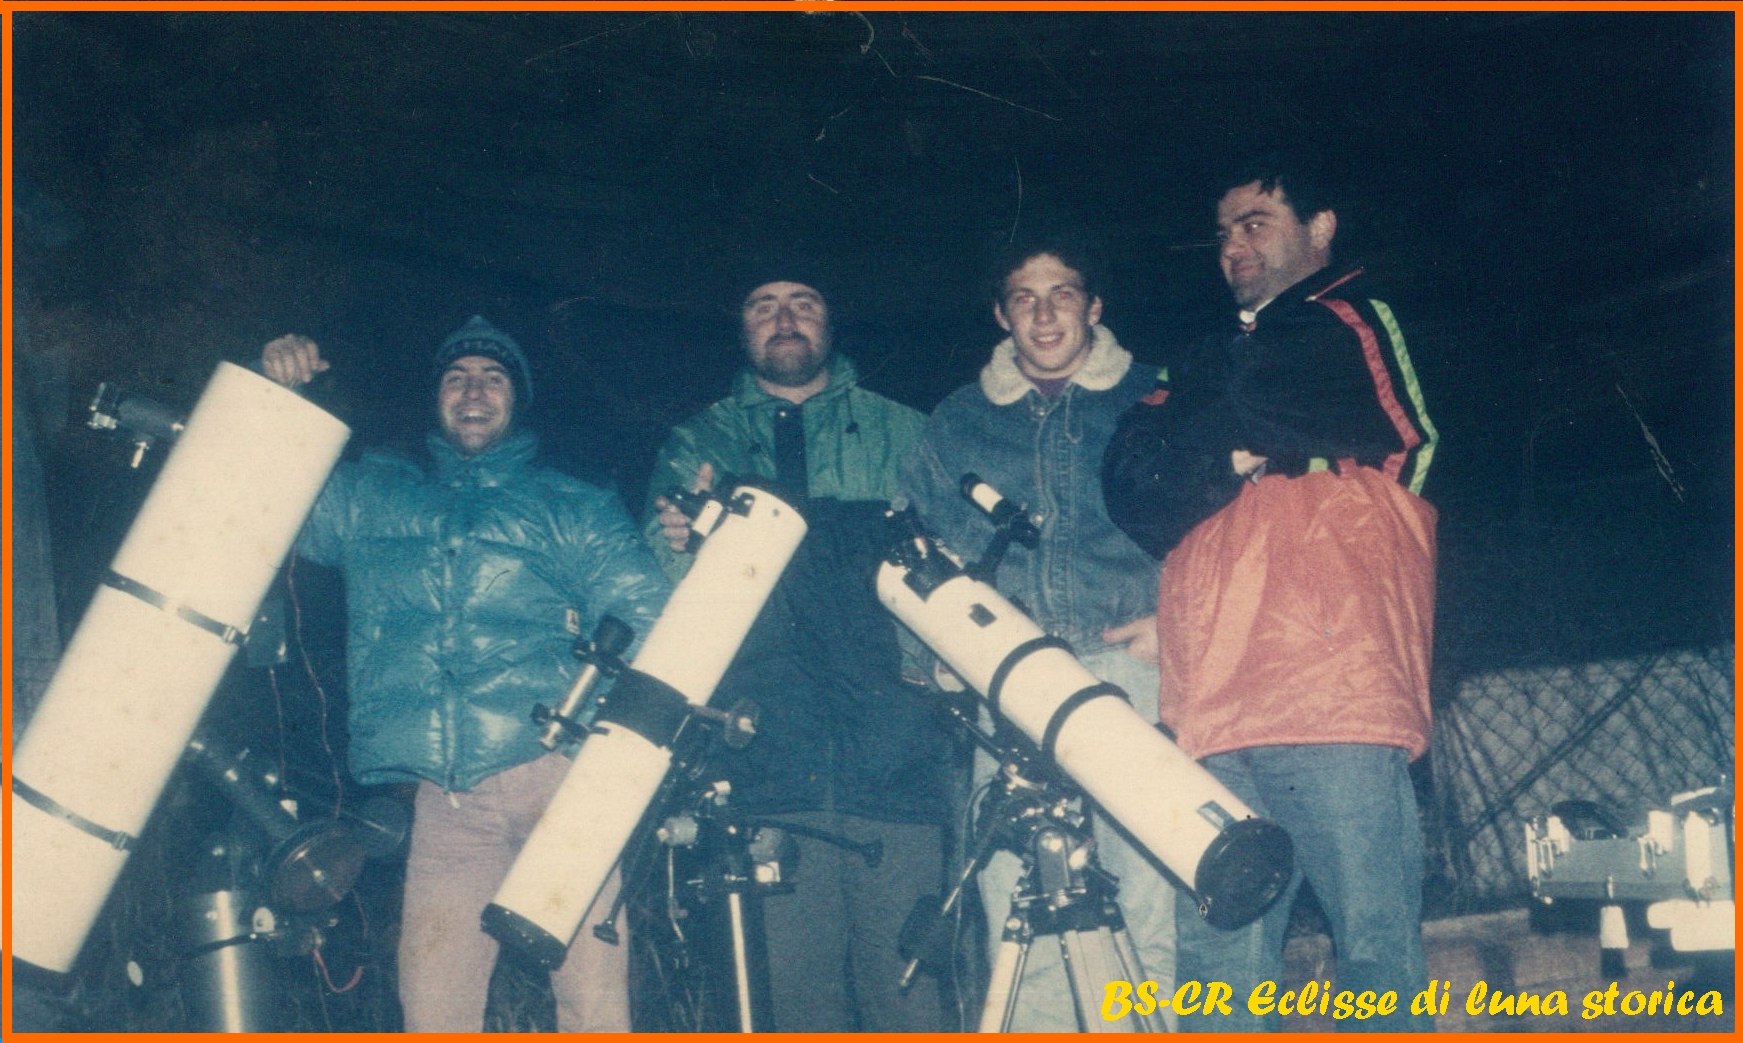 bs_cr_ecloisse-luna-storica.jpg